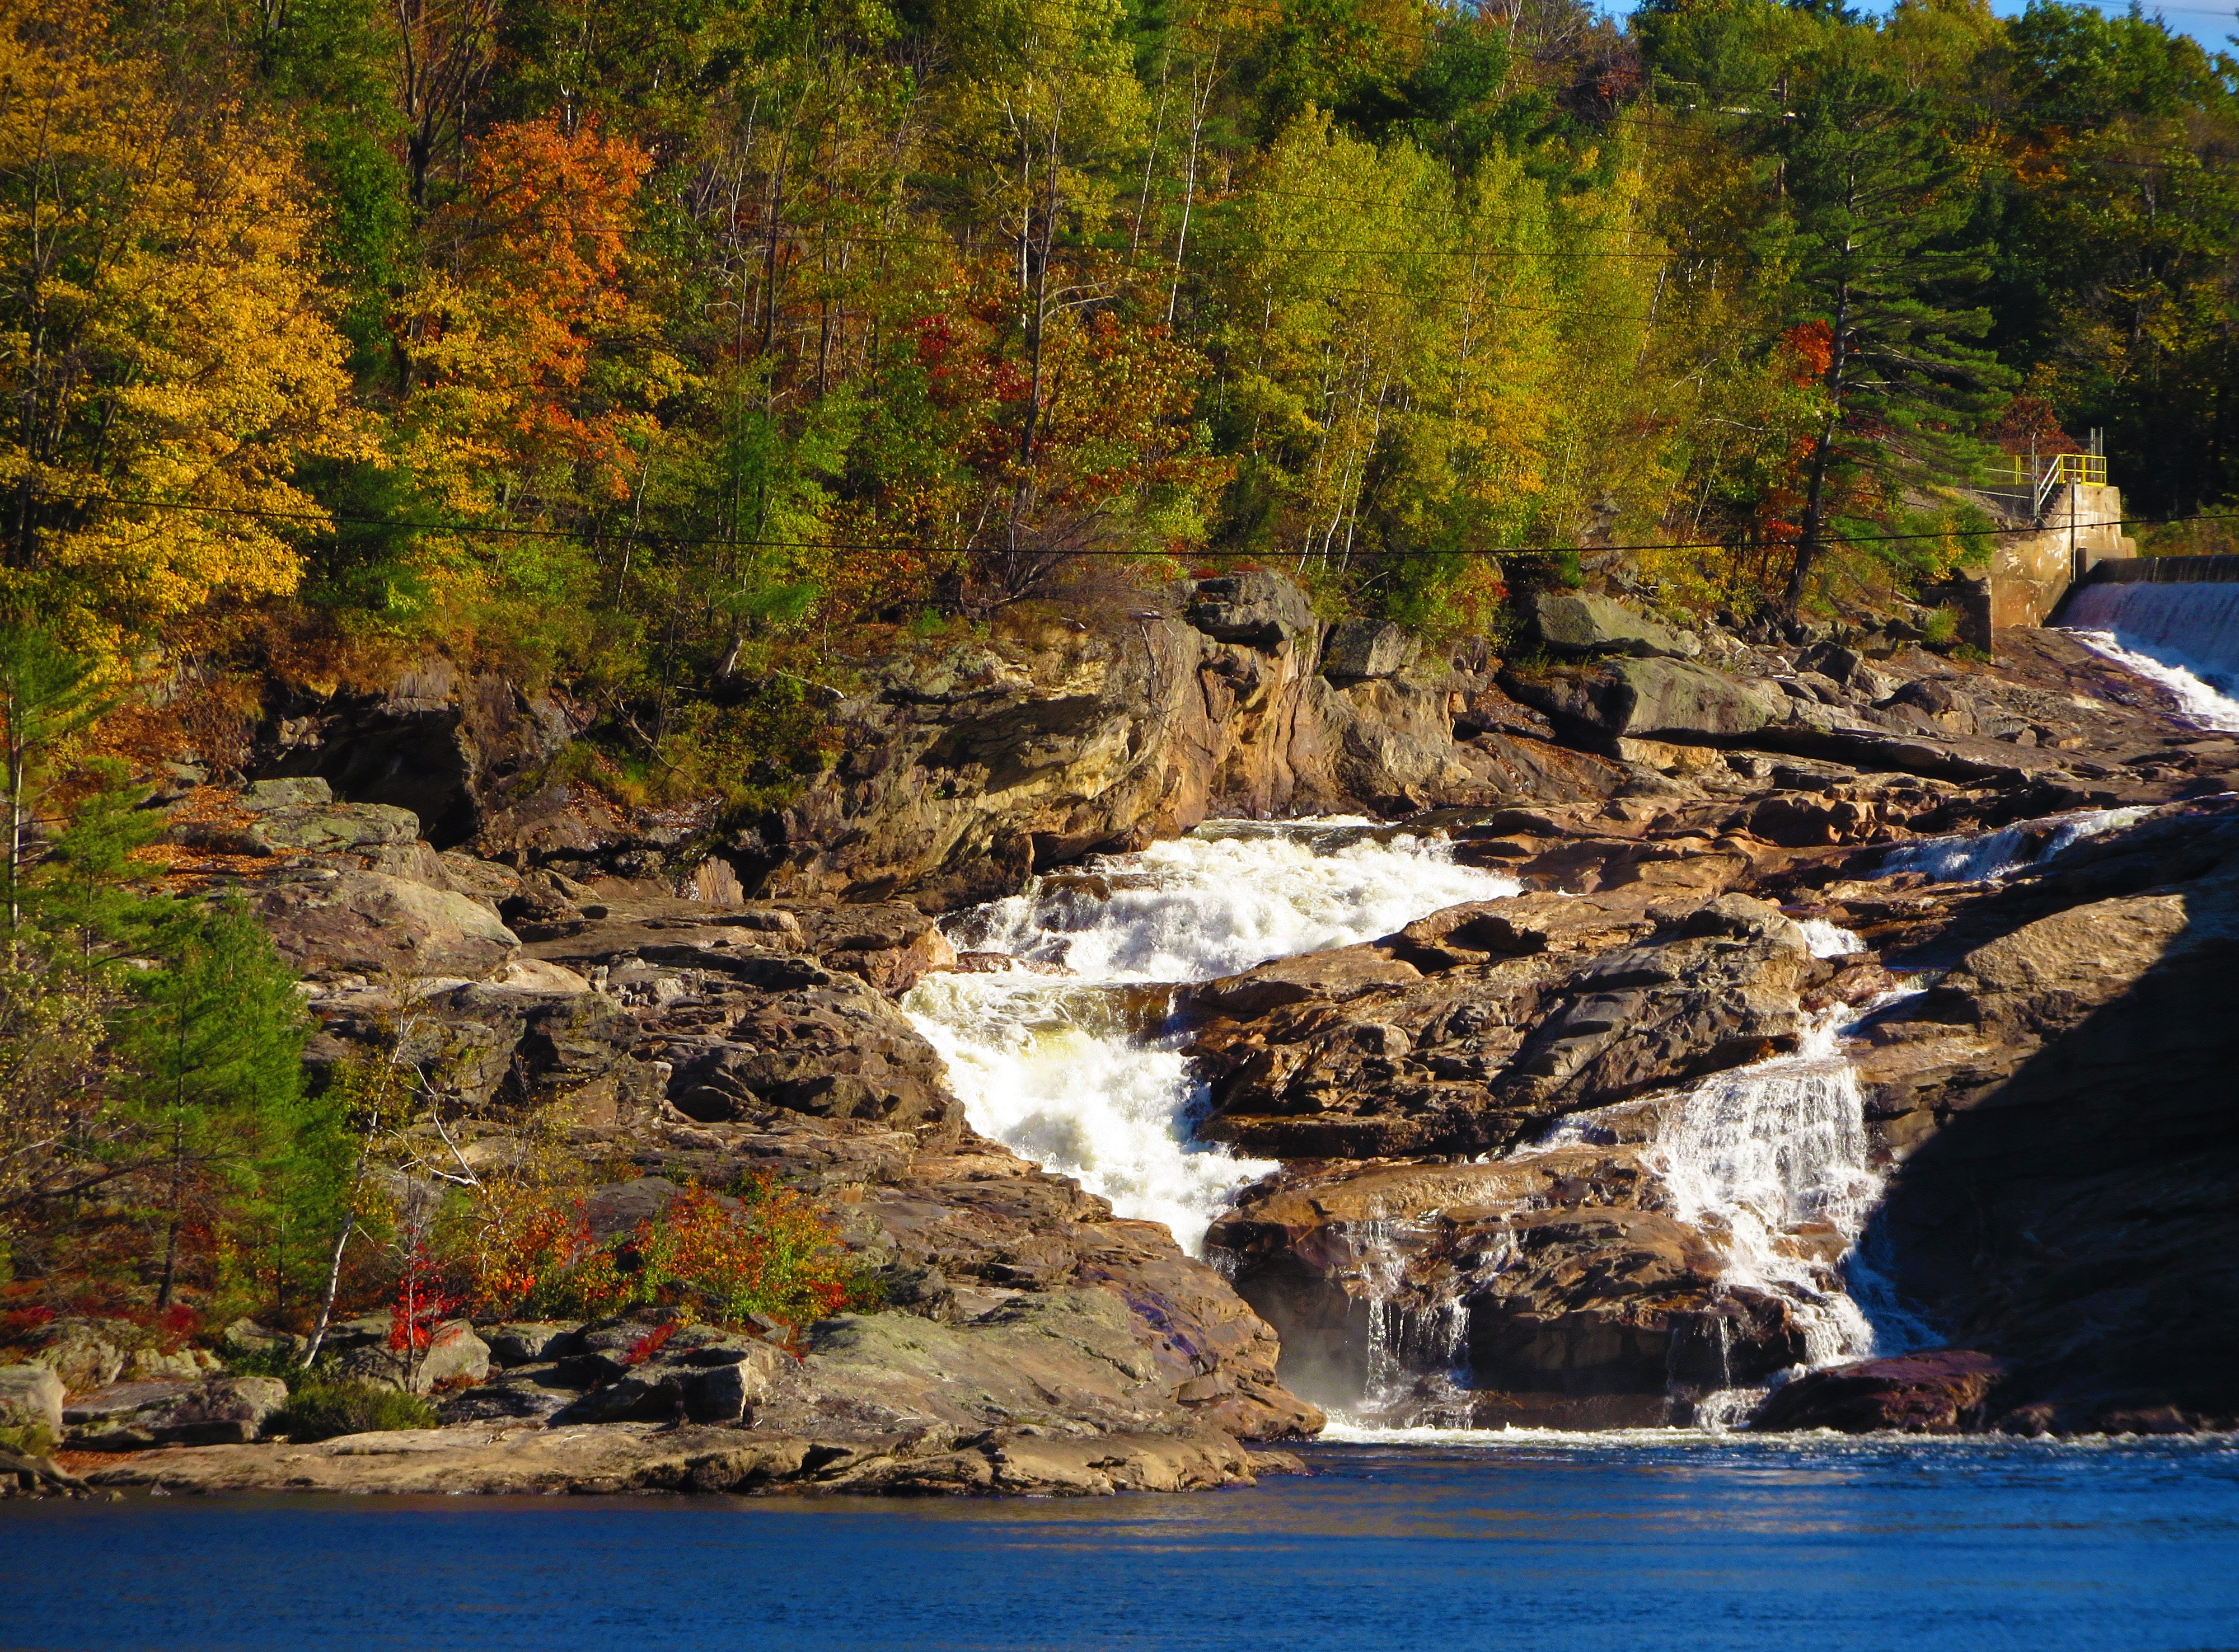 Rumford Falls in Autumn, Splash, Serene, River, Photos, HQ Photo